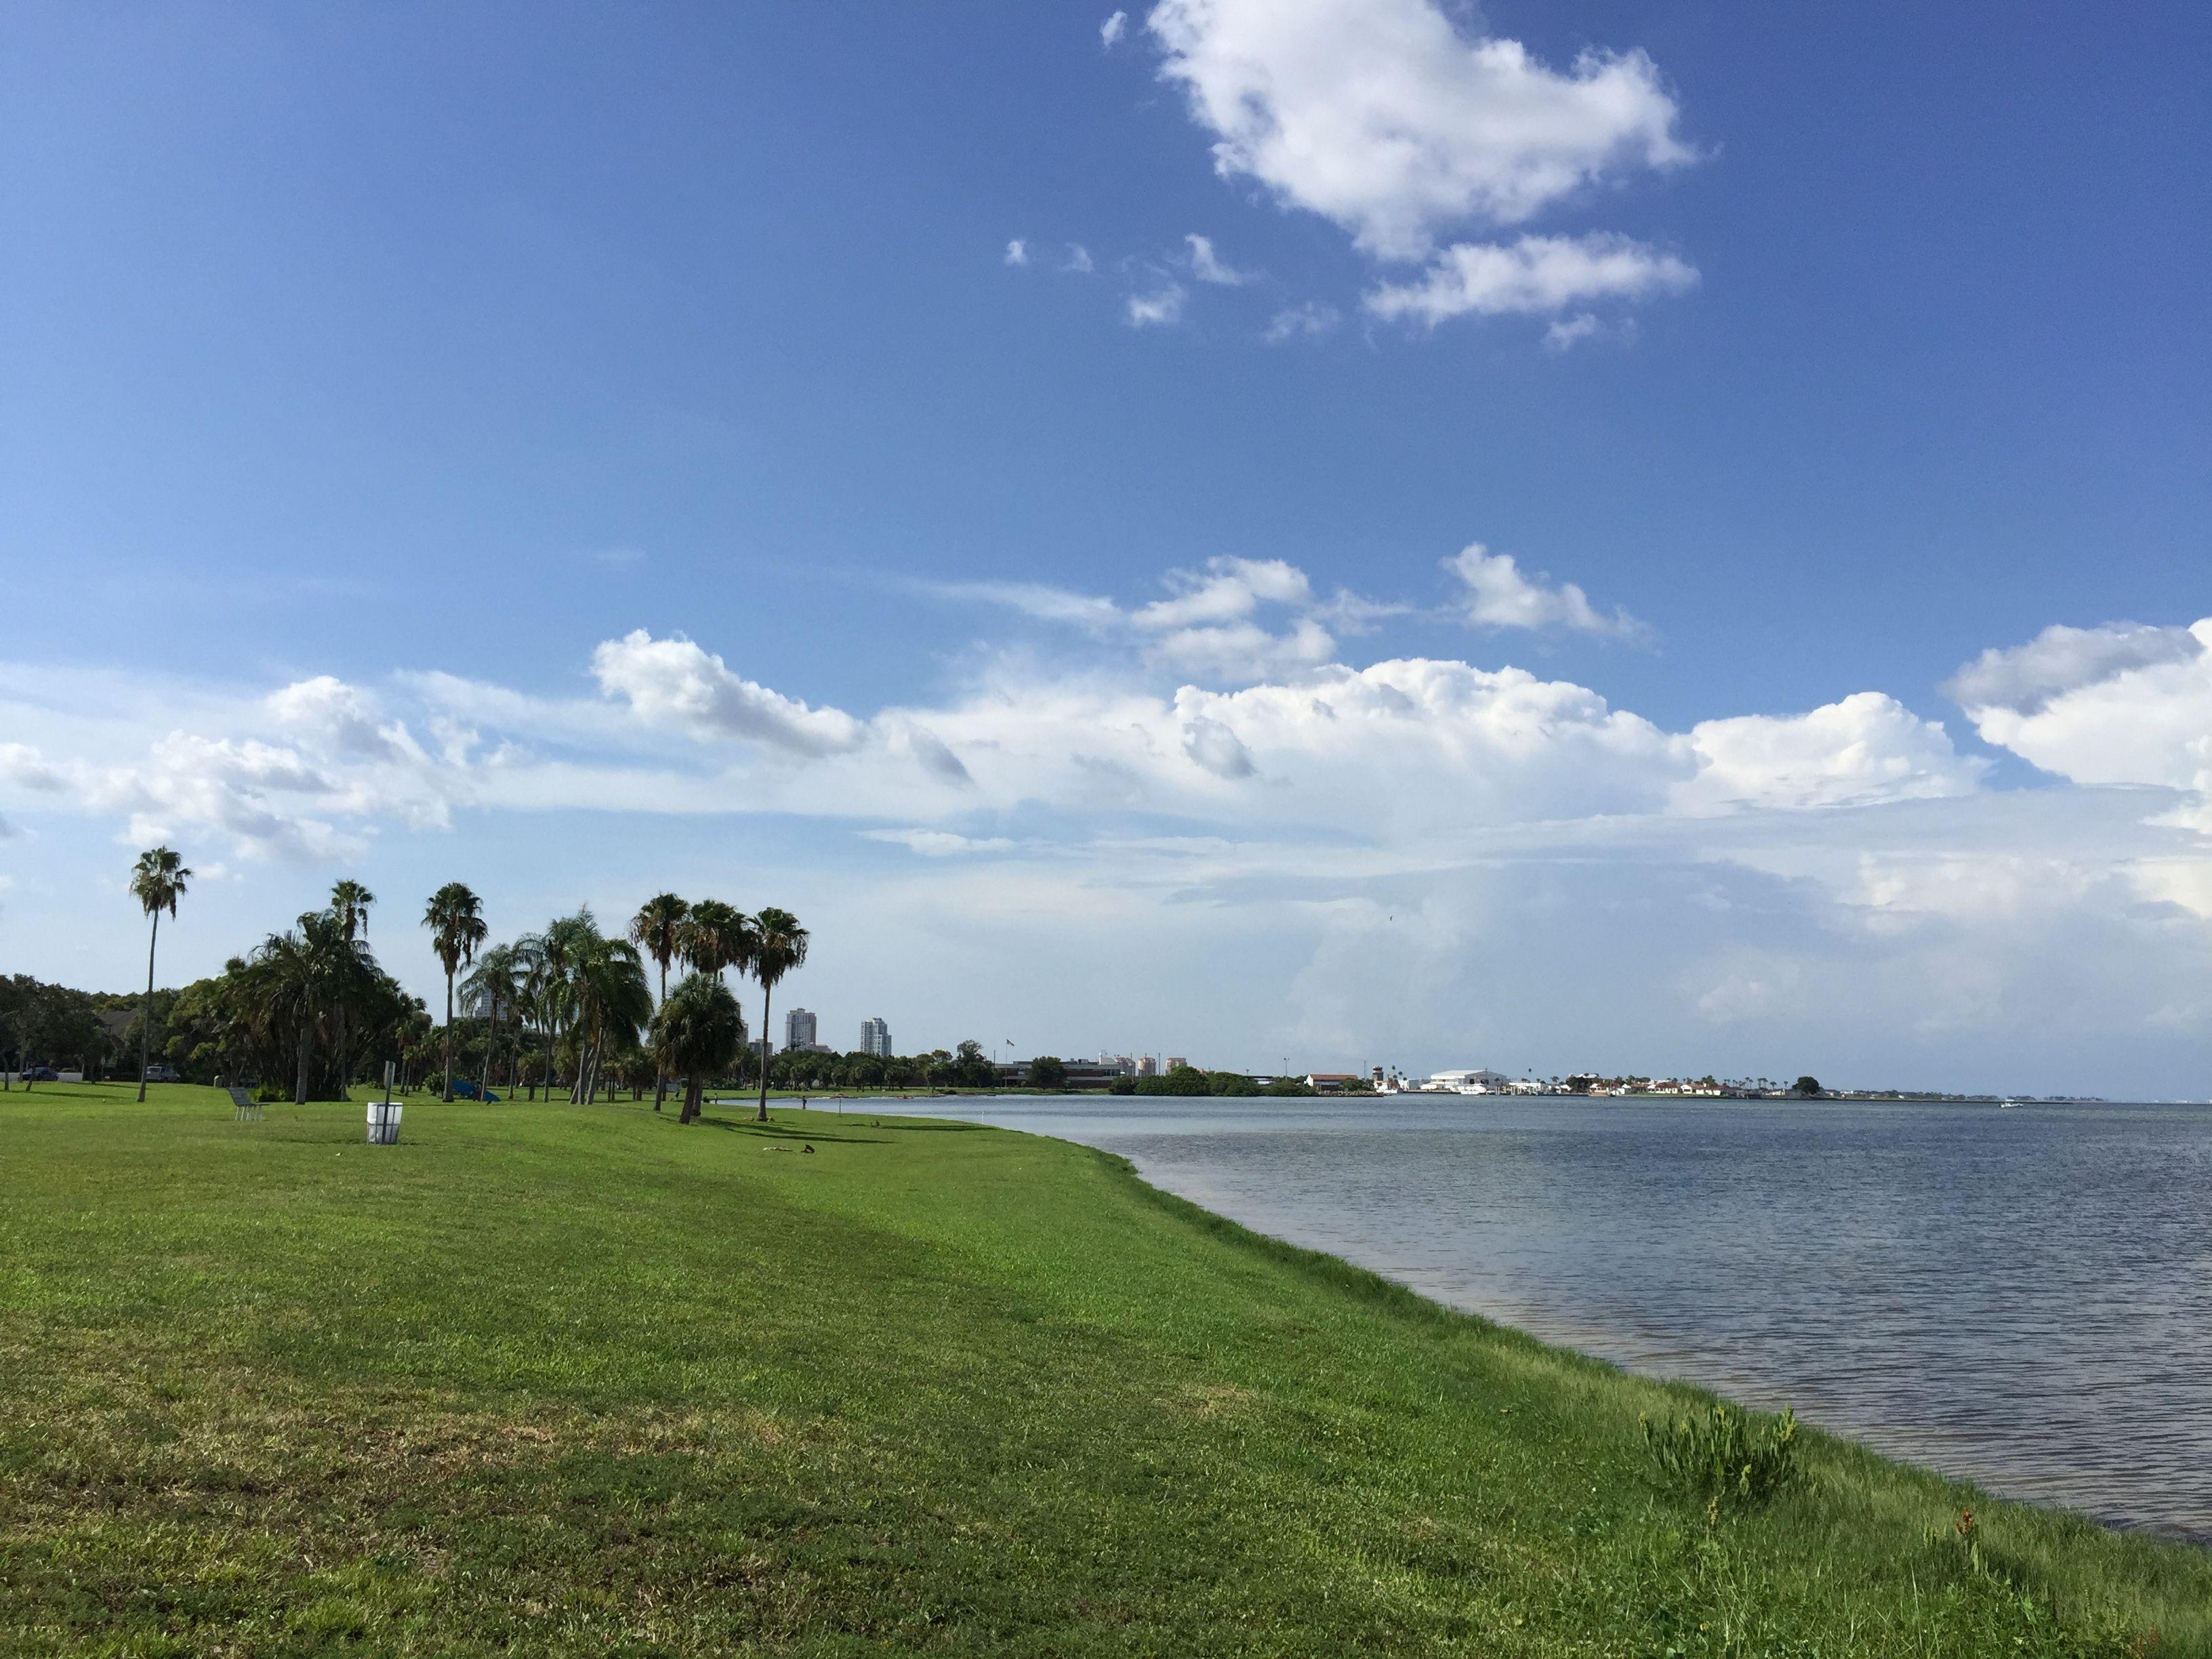 Beautiful day at Lassing Park in StPete! St. Petersburg